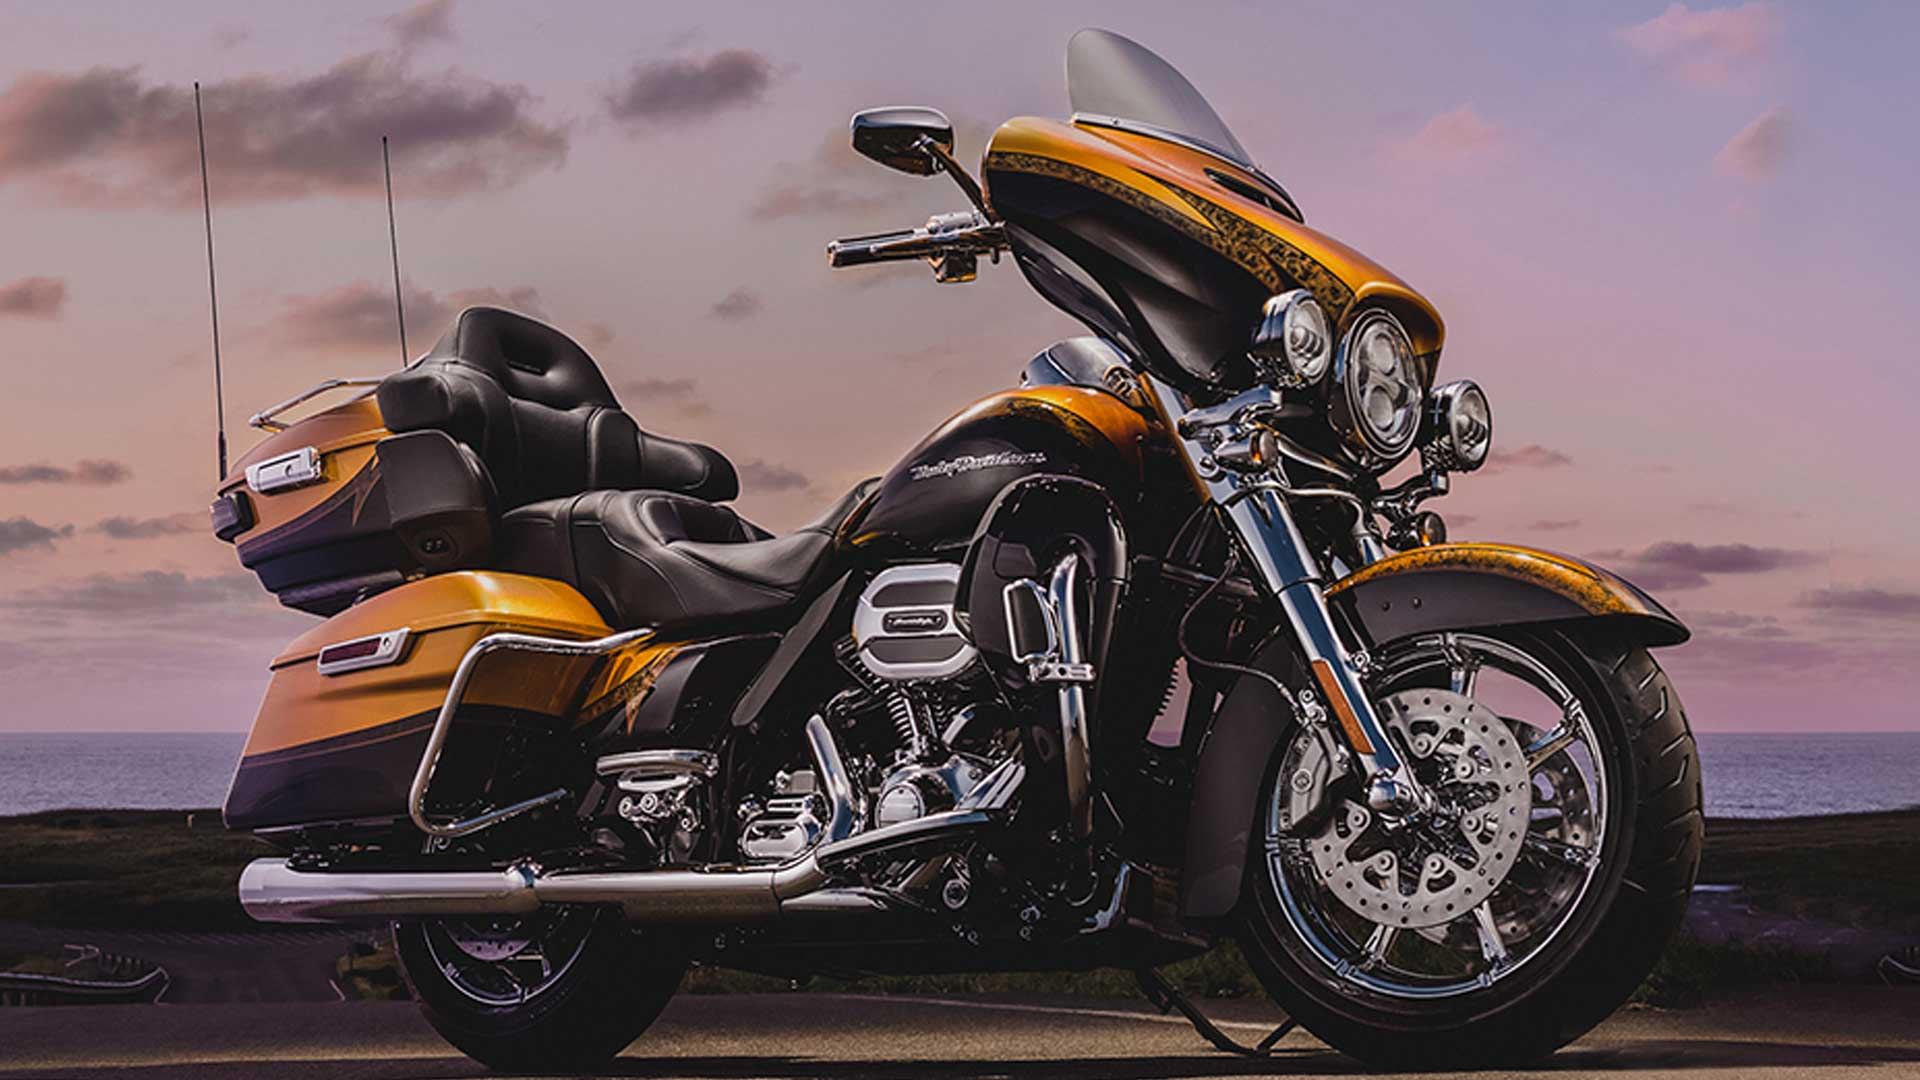 Harley-Davidson CVO Limited 2015 STD Exterior